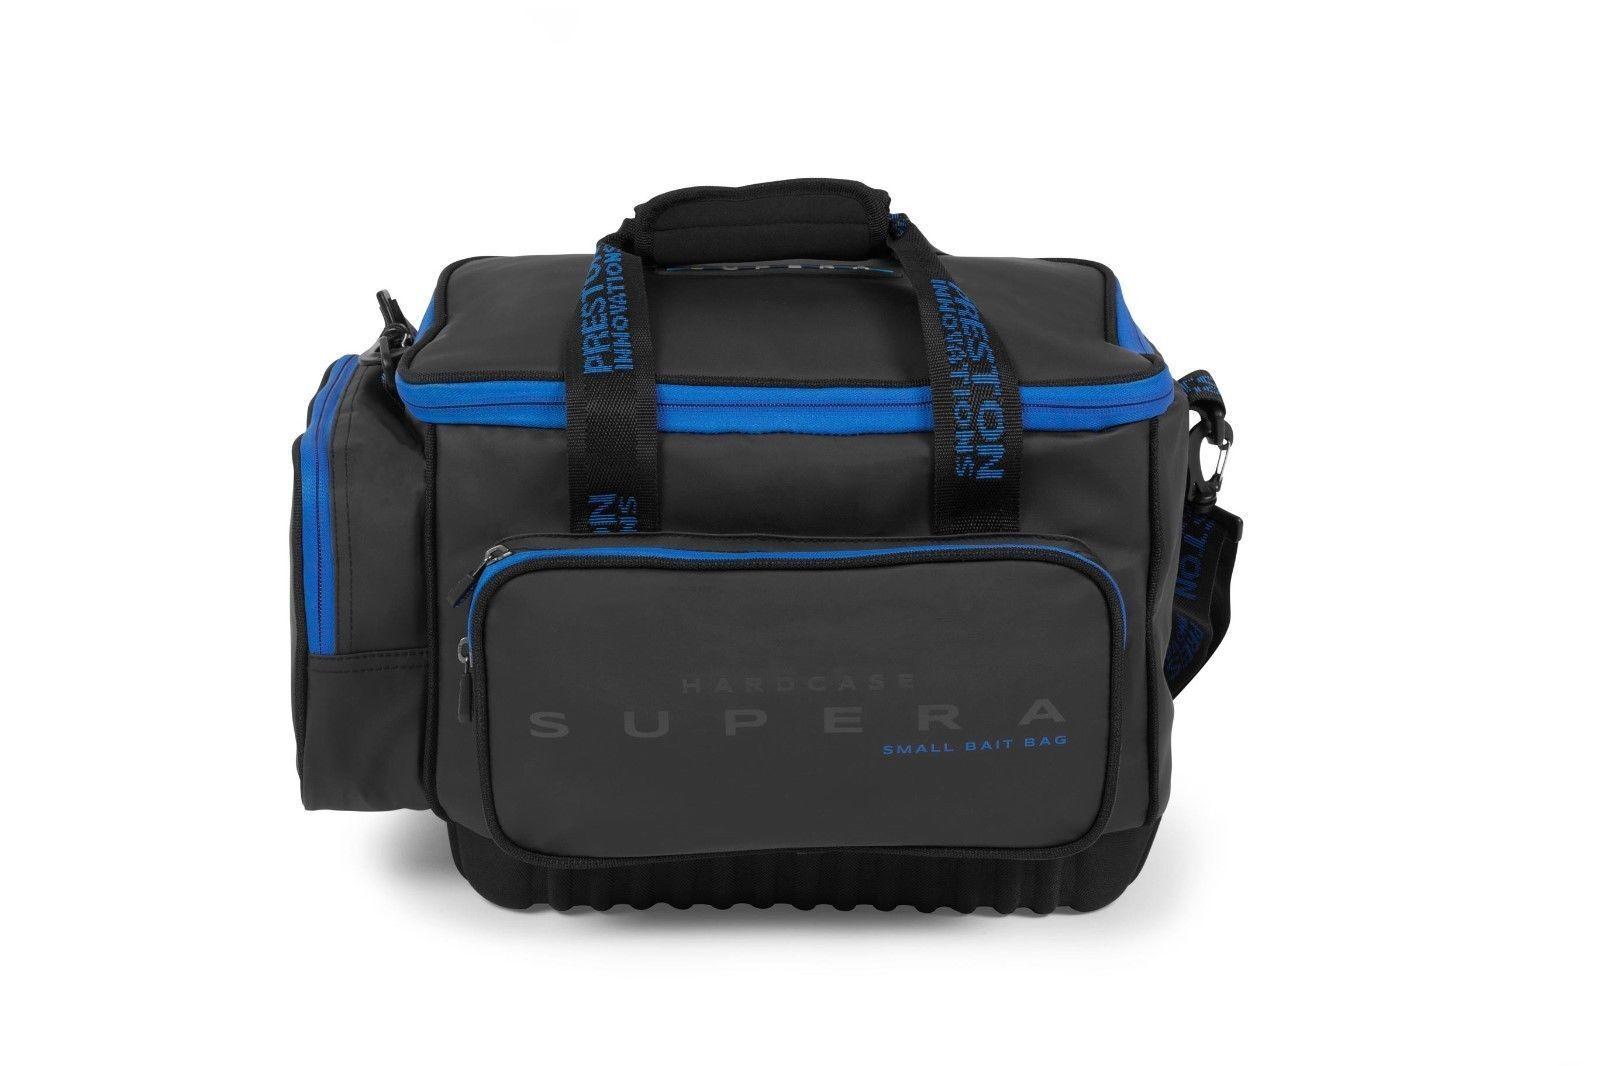 NEW Preston Innovations Hardcase Supera Small Bait Bag P0130071